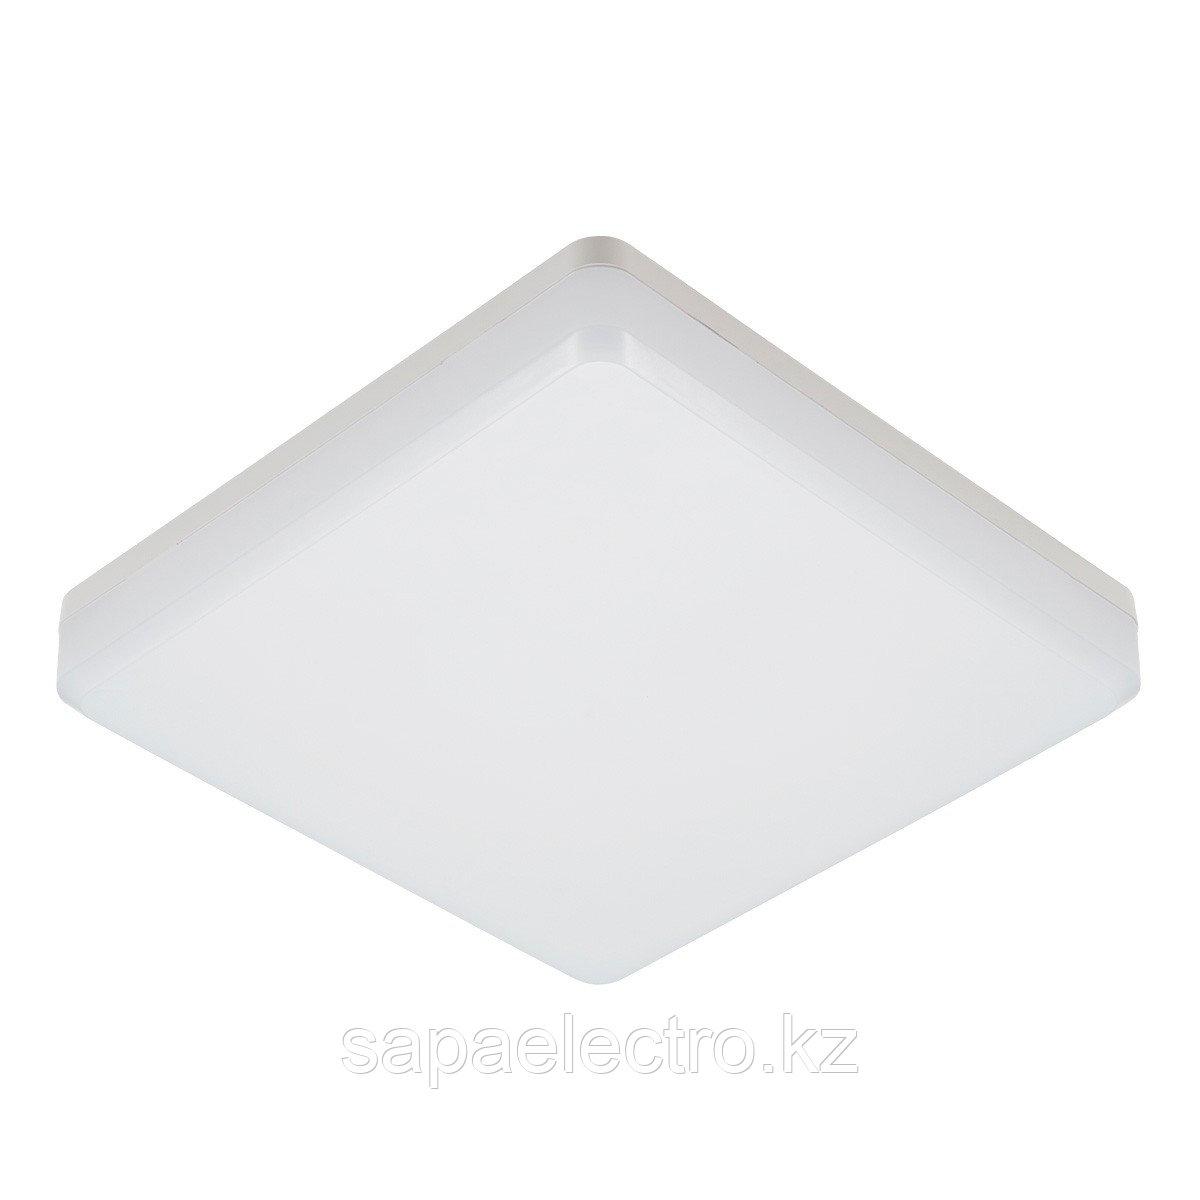 Свет-к LED NIKA SQUARE 15W 5500K IP44 (TS) 24шт